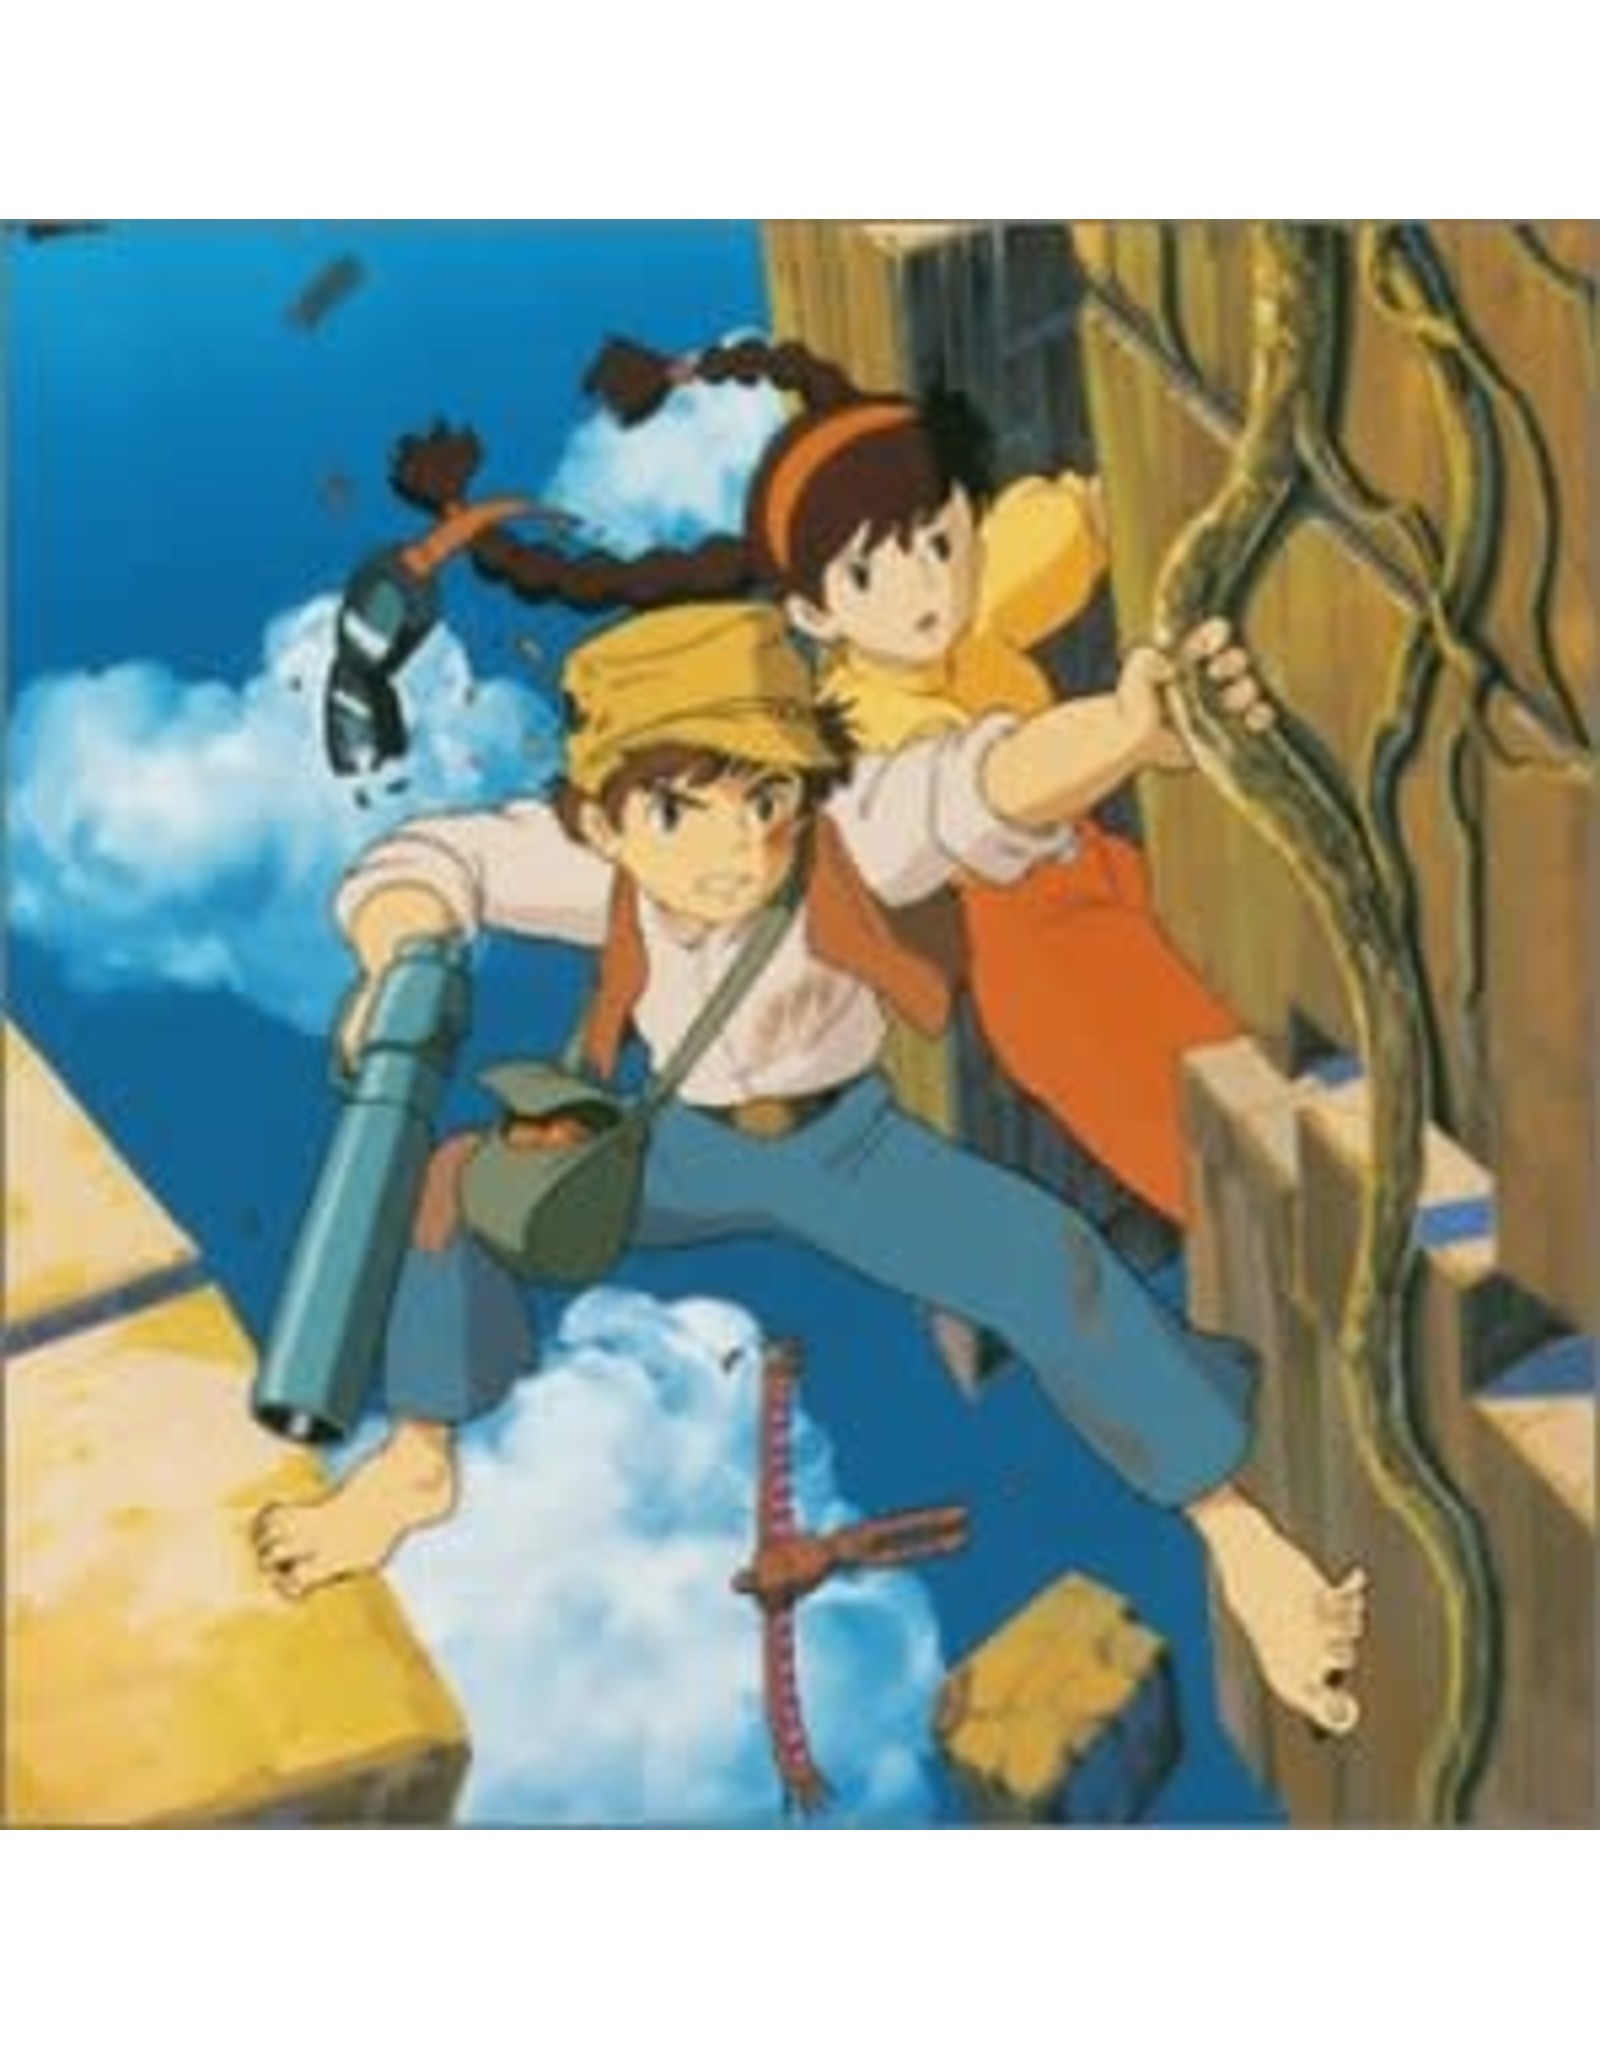 TOKUMA [CD]TENKU NO SHIRO LAPUTA (O.S.T.) [RE-ISSUE]  -STUDIO GHIBLI-